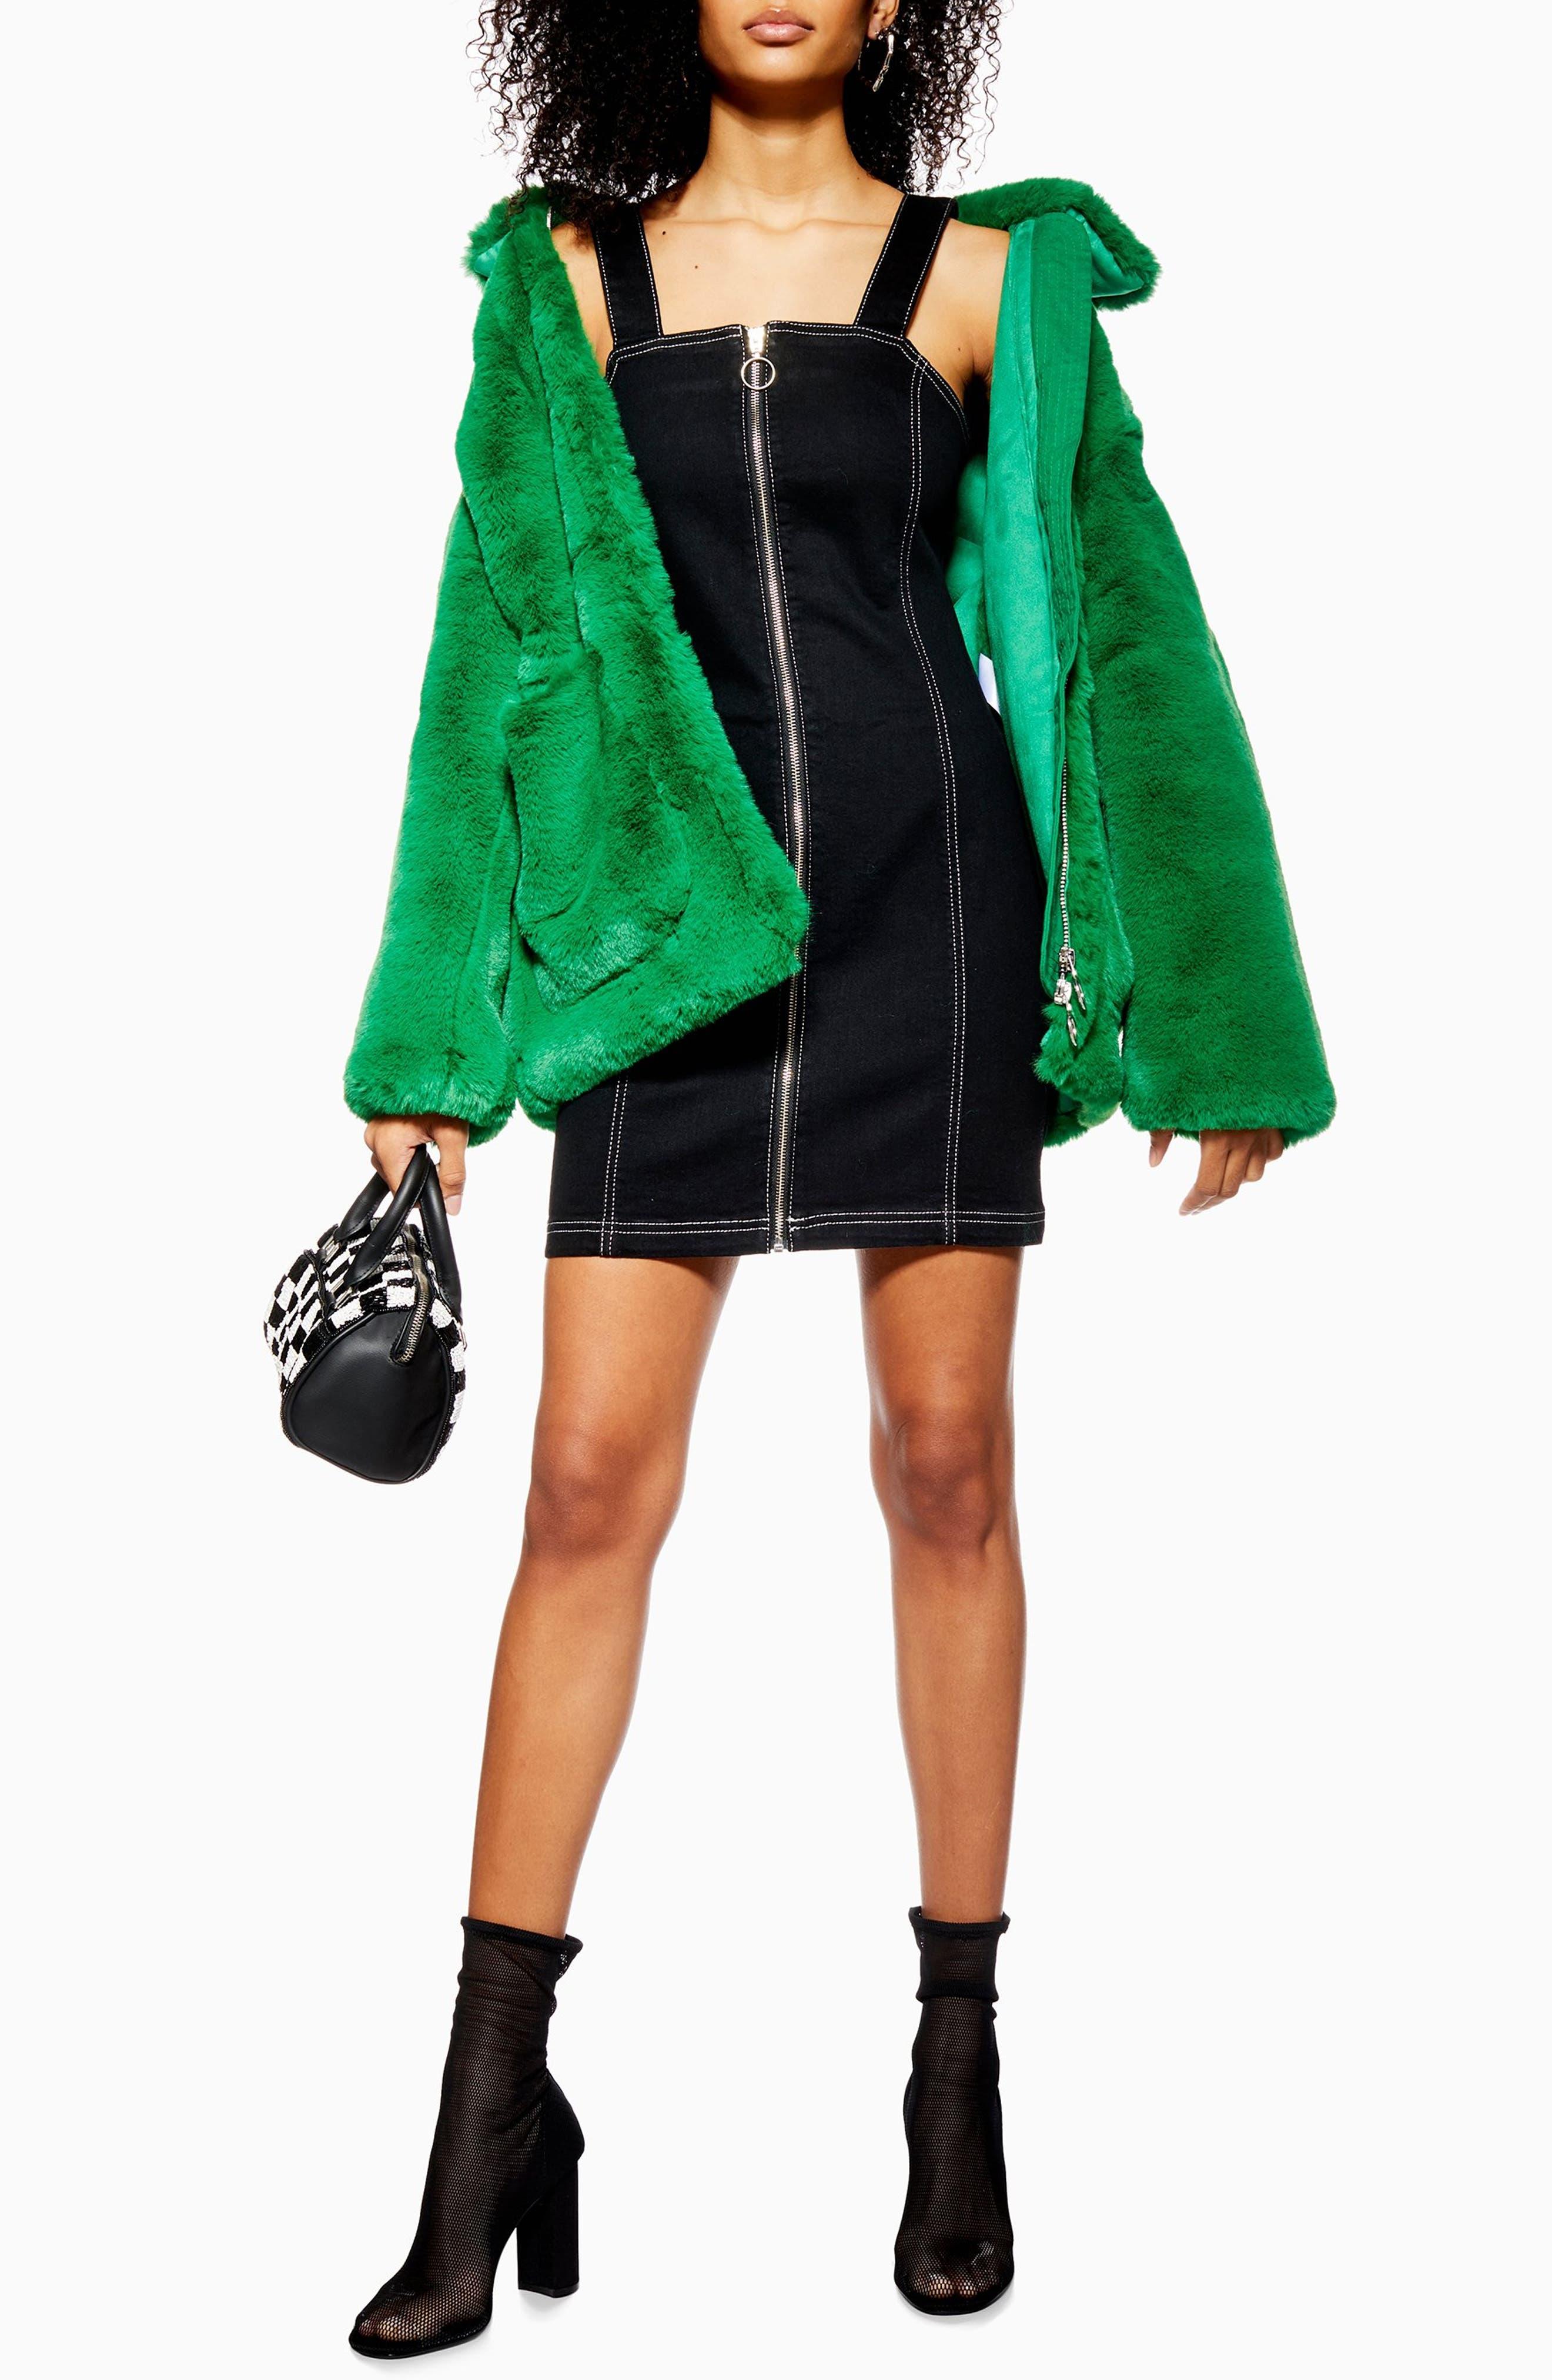 Topshop Stretch Denim Zip Dress, US (fits like 0) - Black